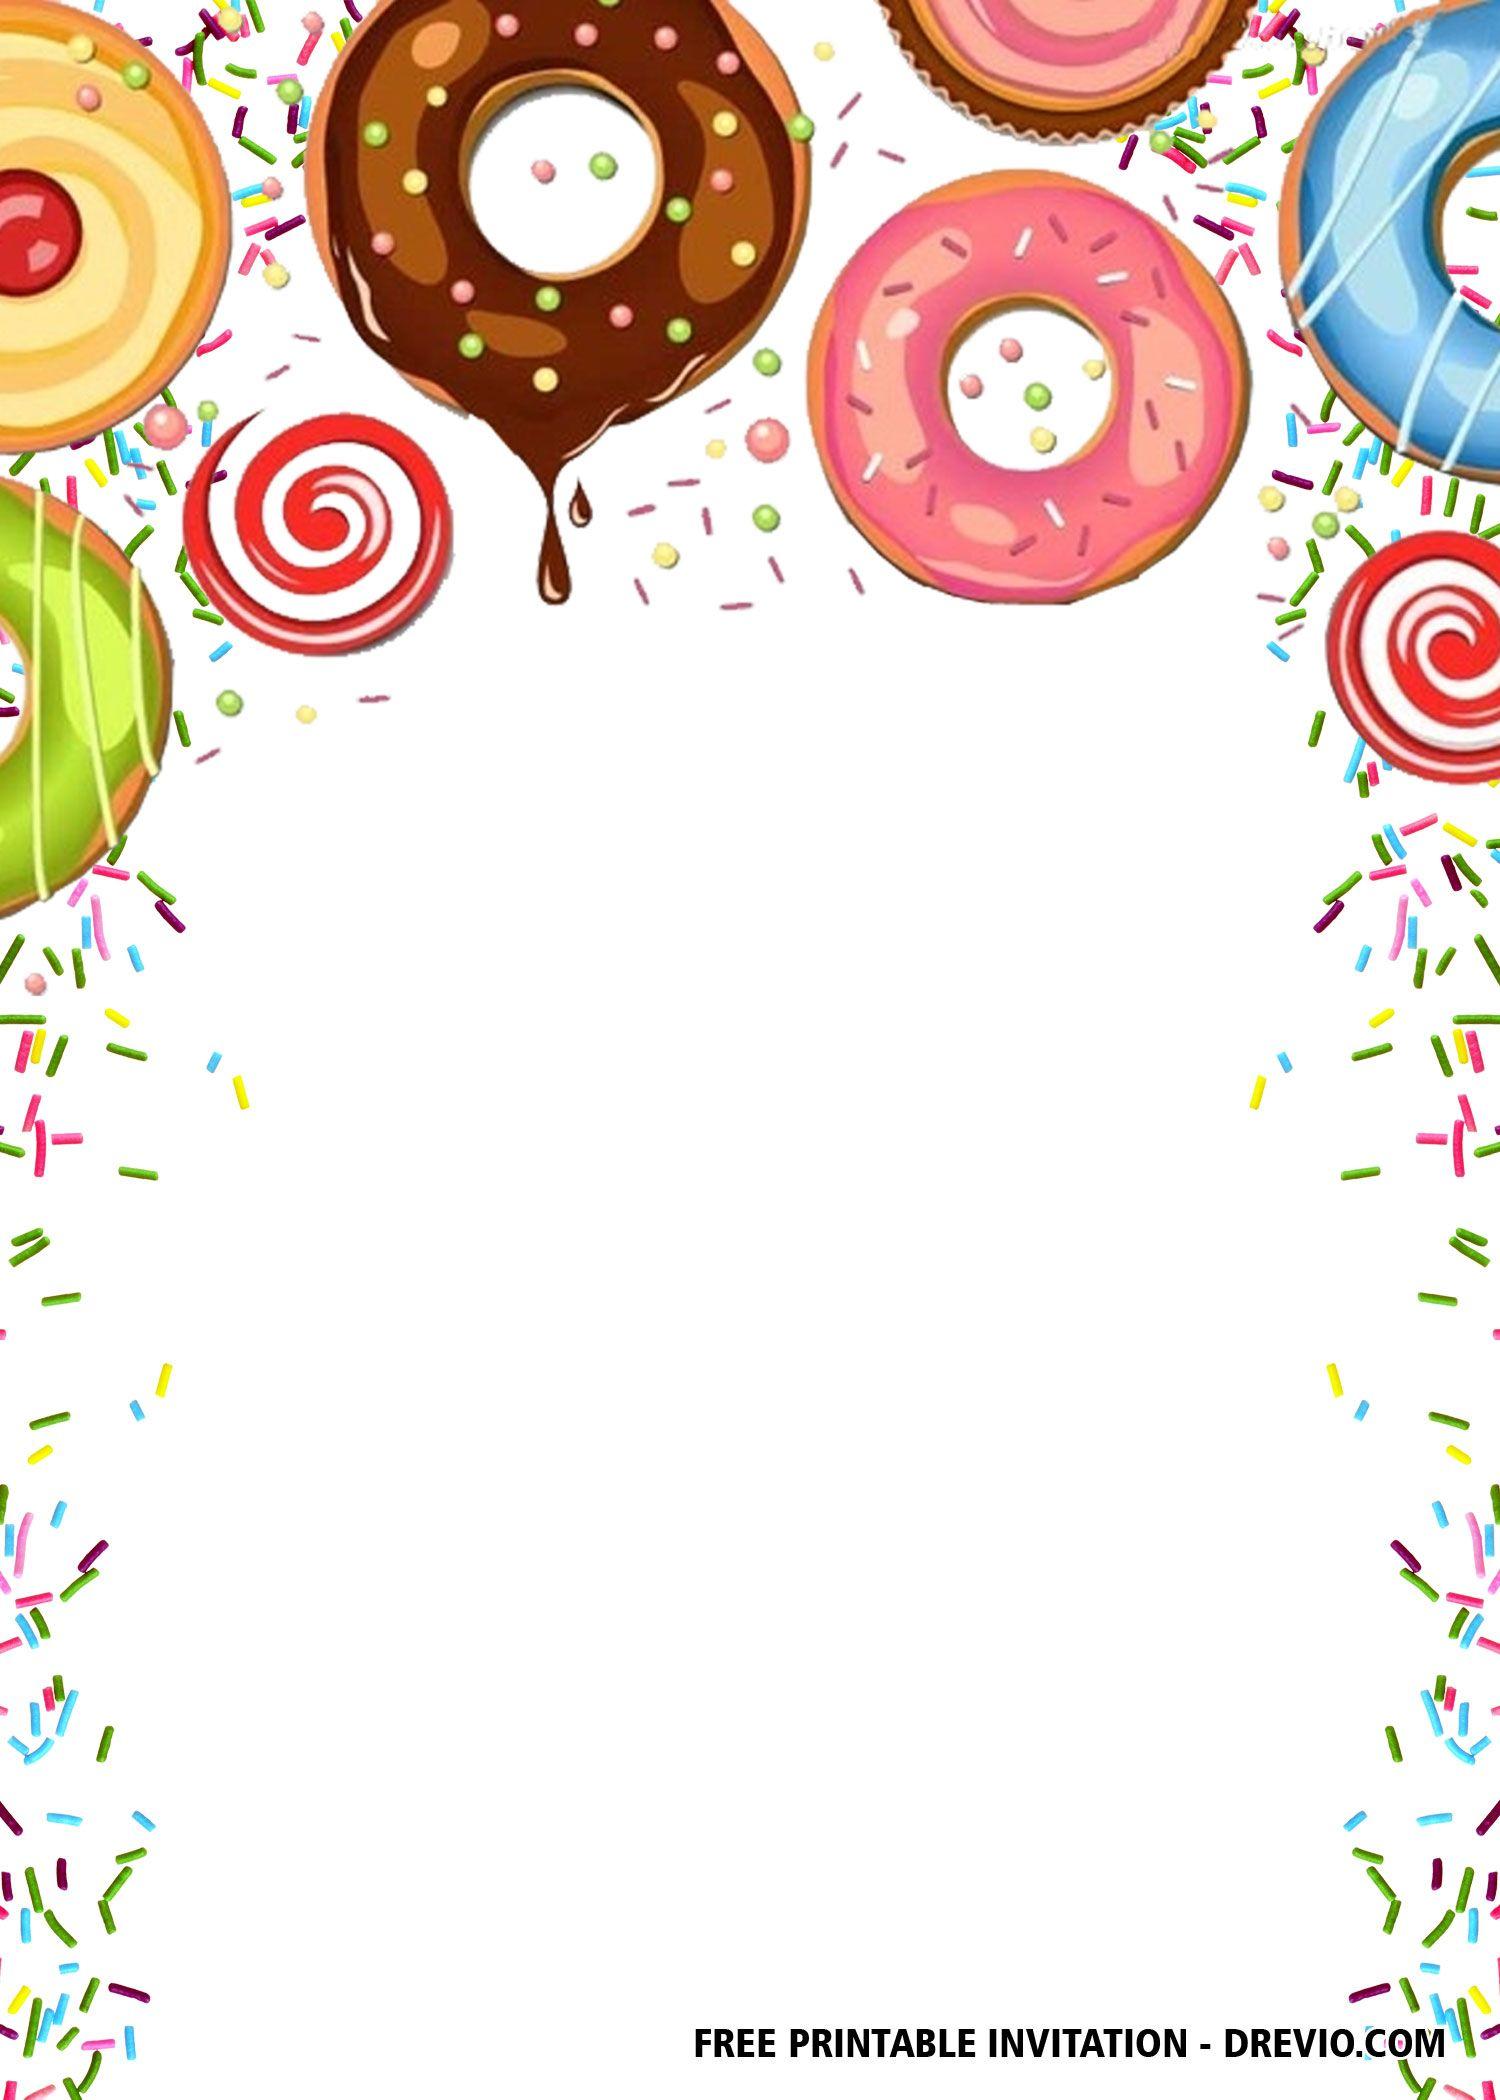 Free Editable Donuts Party Invitation Templates Free Printable Birthday Invitations Party Invite Template Birthday Party Invitations Free